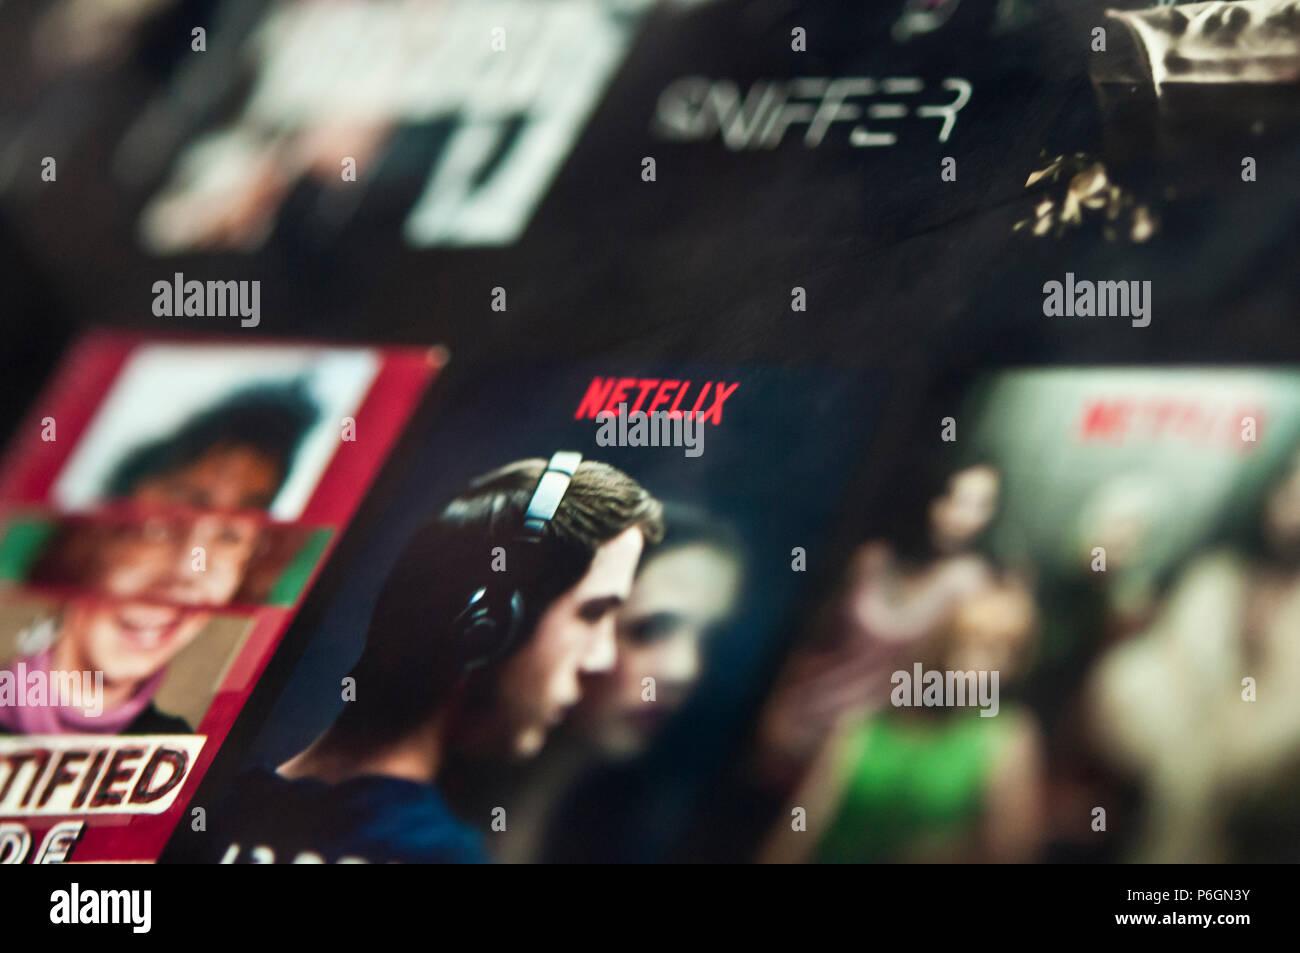 Netflix Bildschirm Stockbild